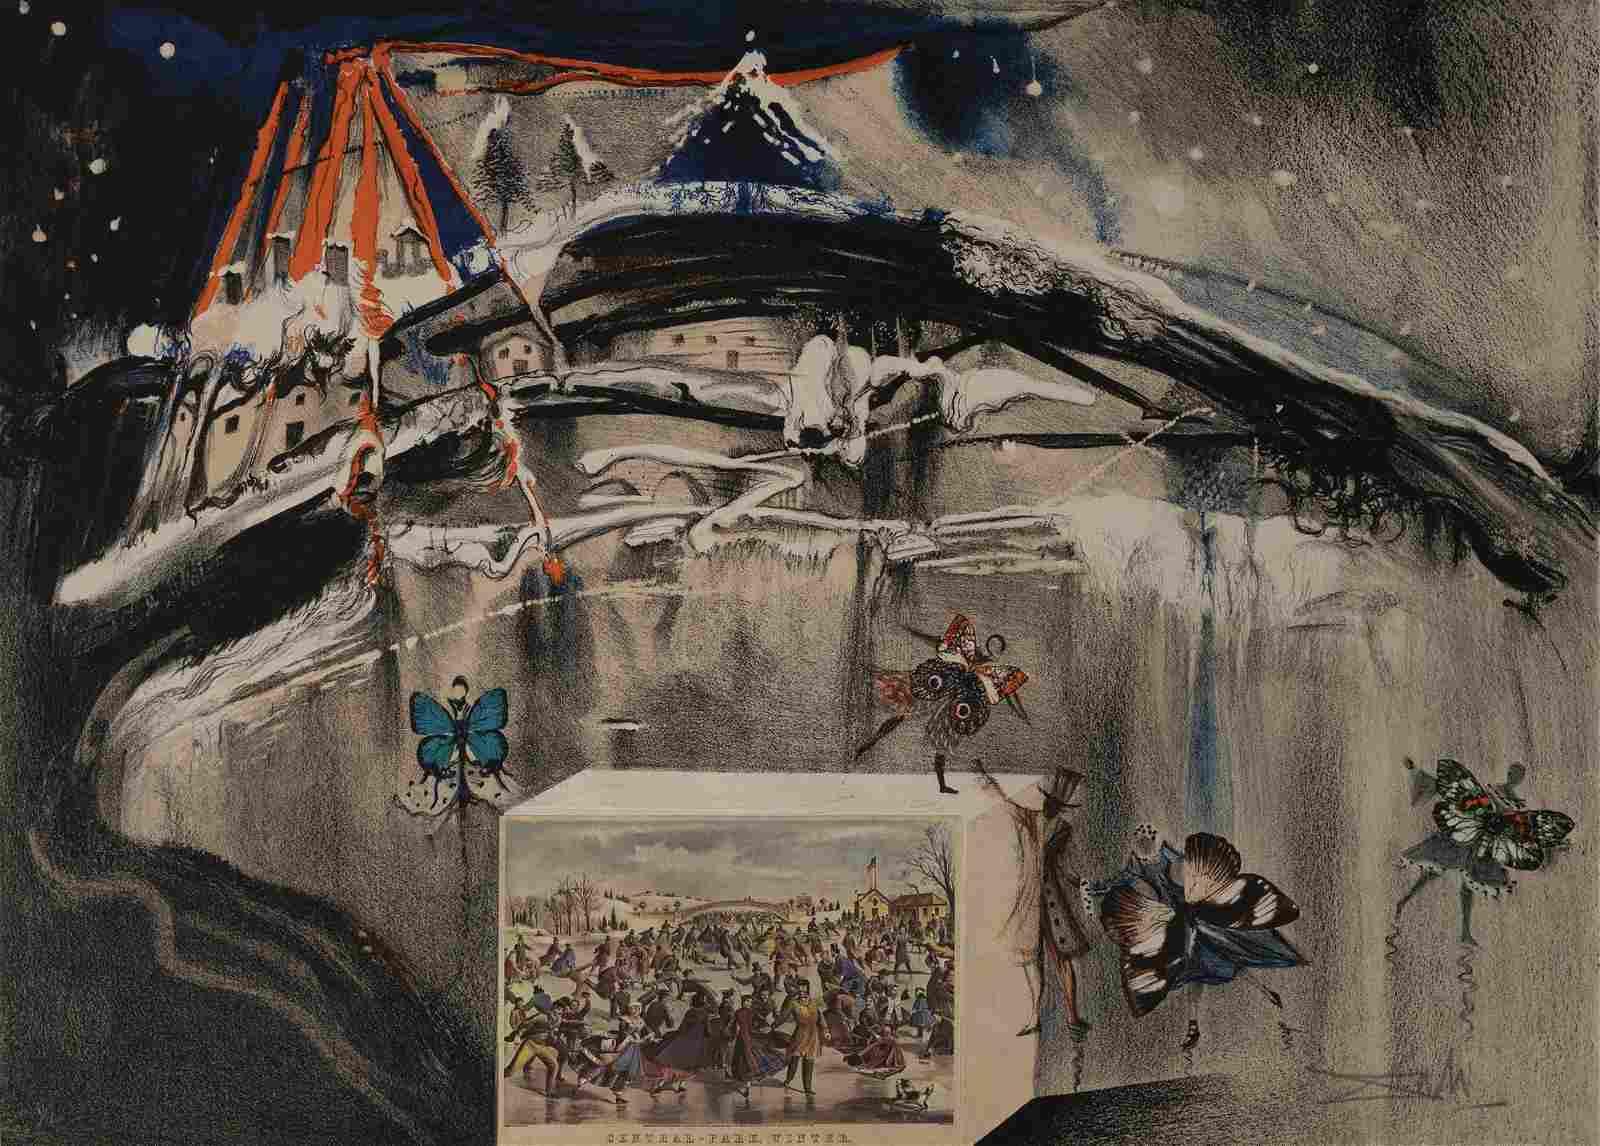 Salvador Dali - Currier & Ives series: Central Park,